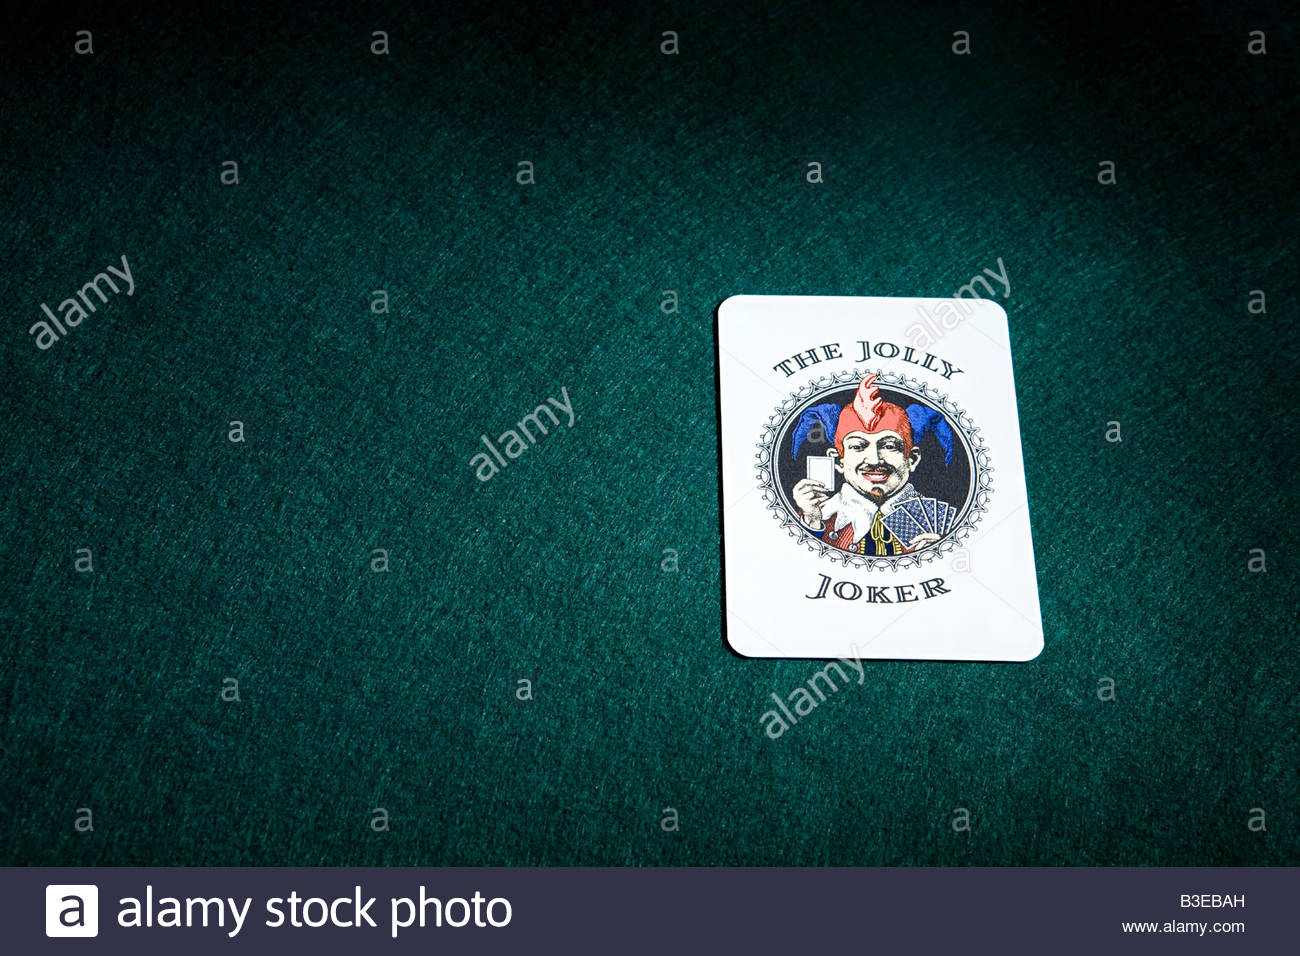 A joker playing card - Stock Image